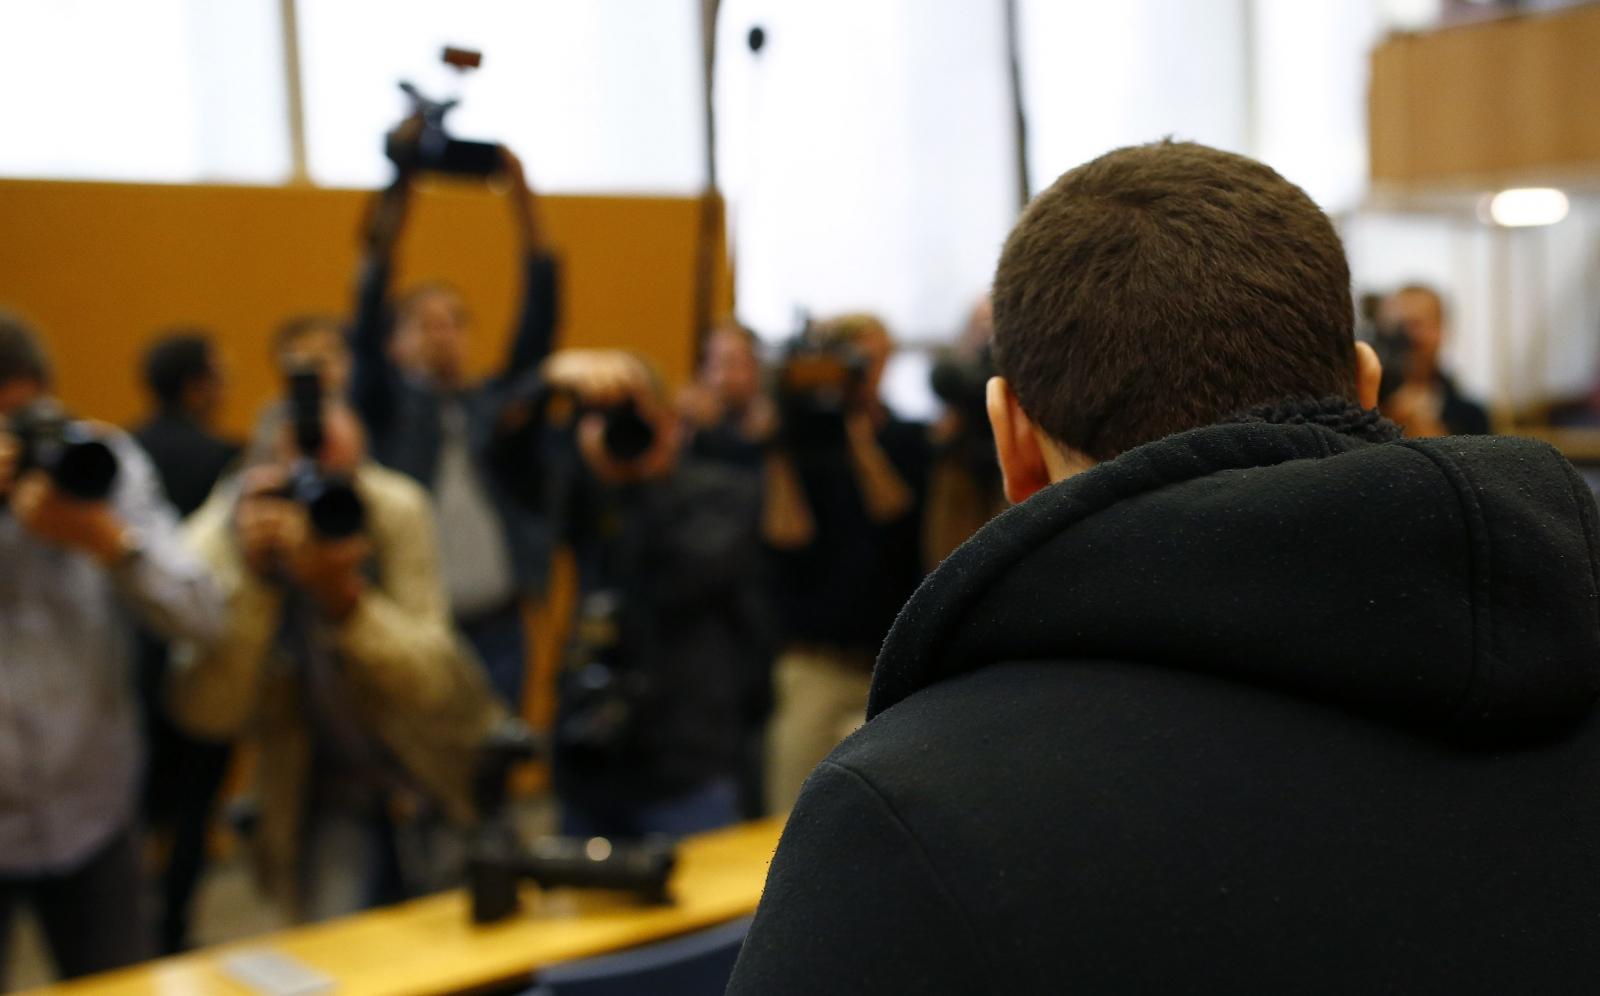 Defendant Kreshnik B., waits for the start of his trial in a courtroom in Frankfurt